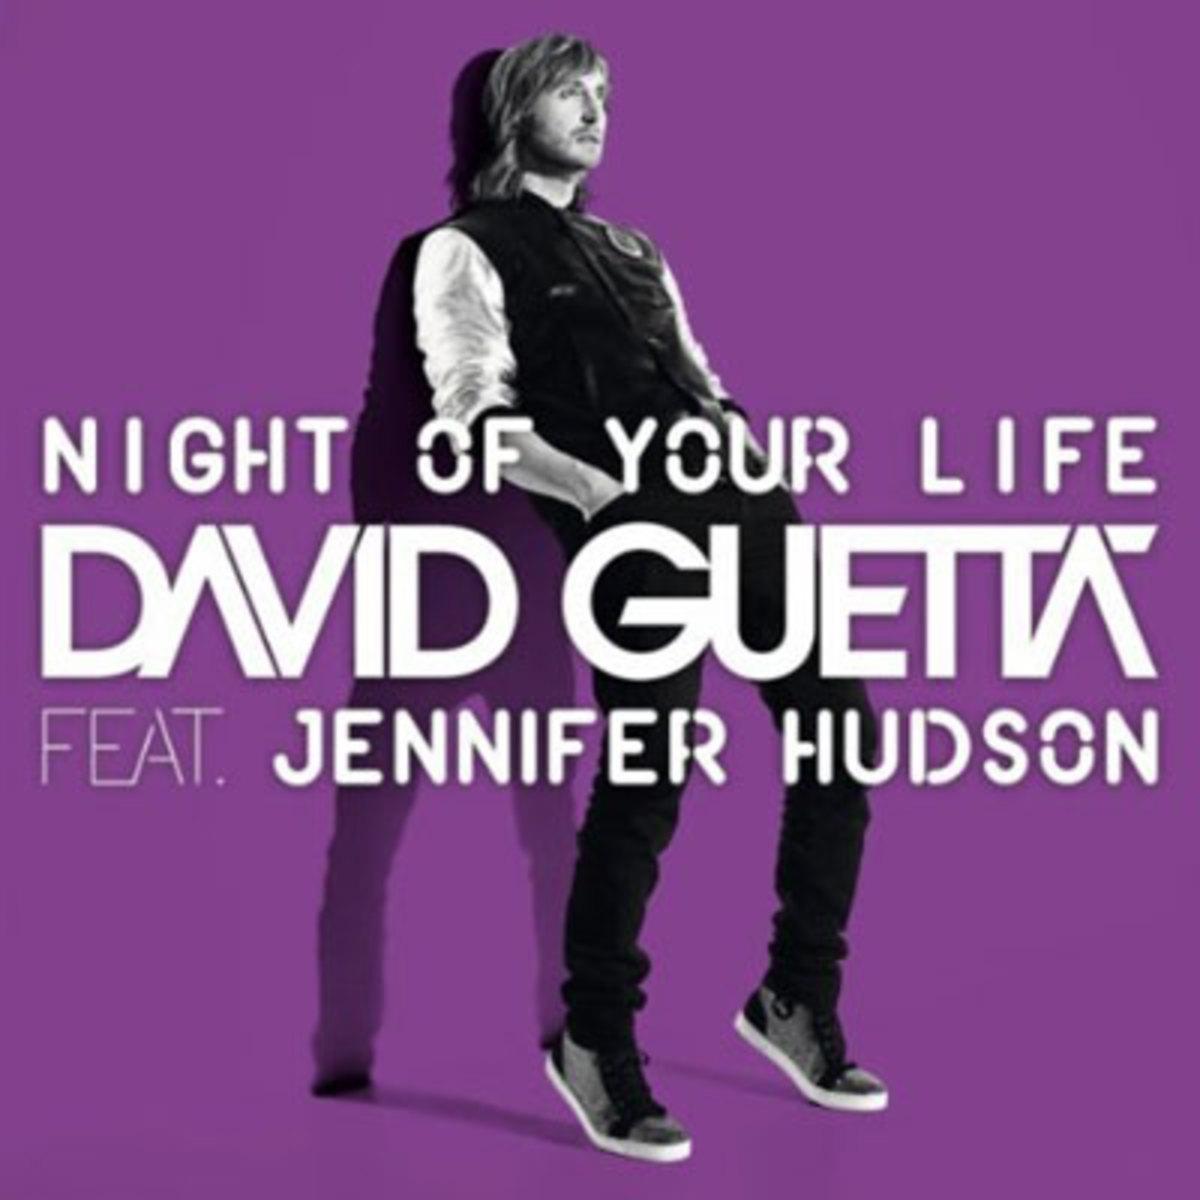 davidguetta-nightofyourlife.jpg